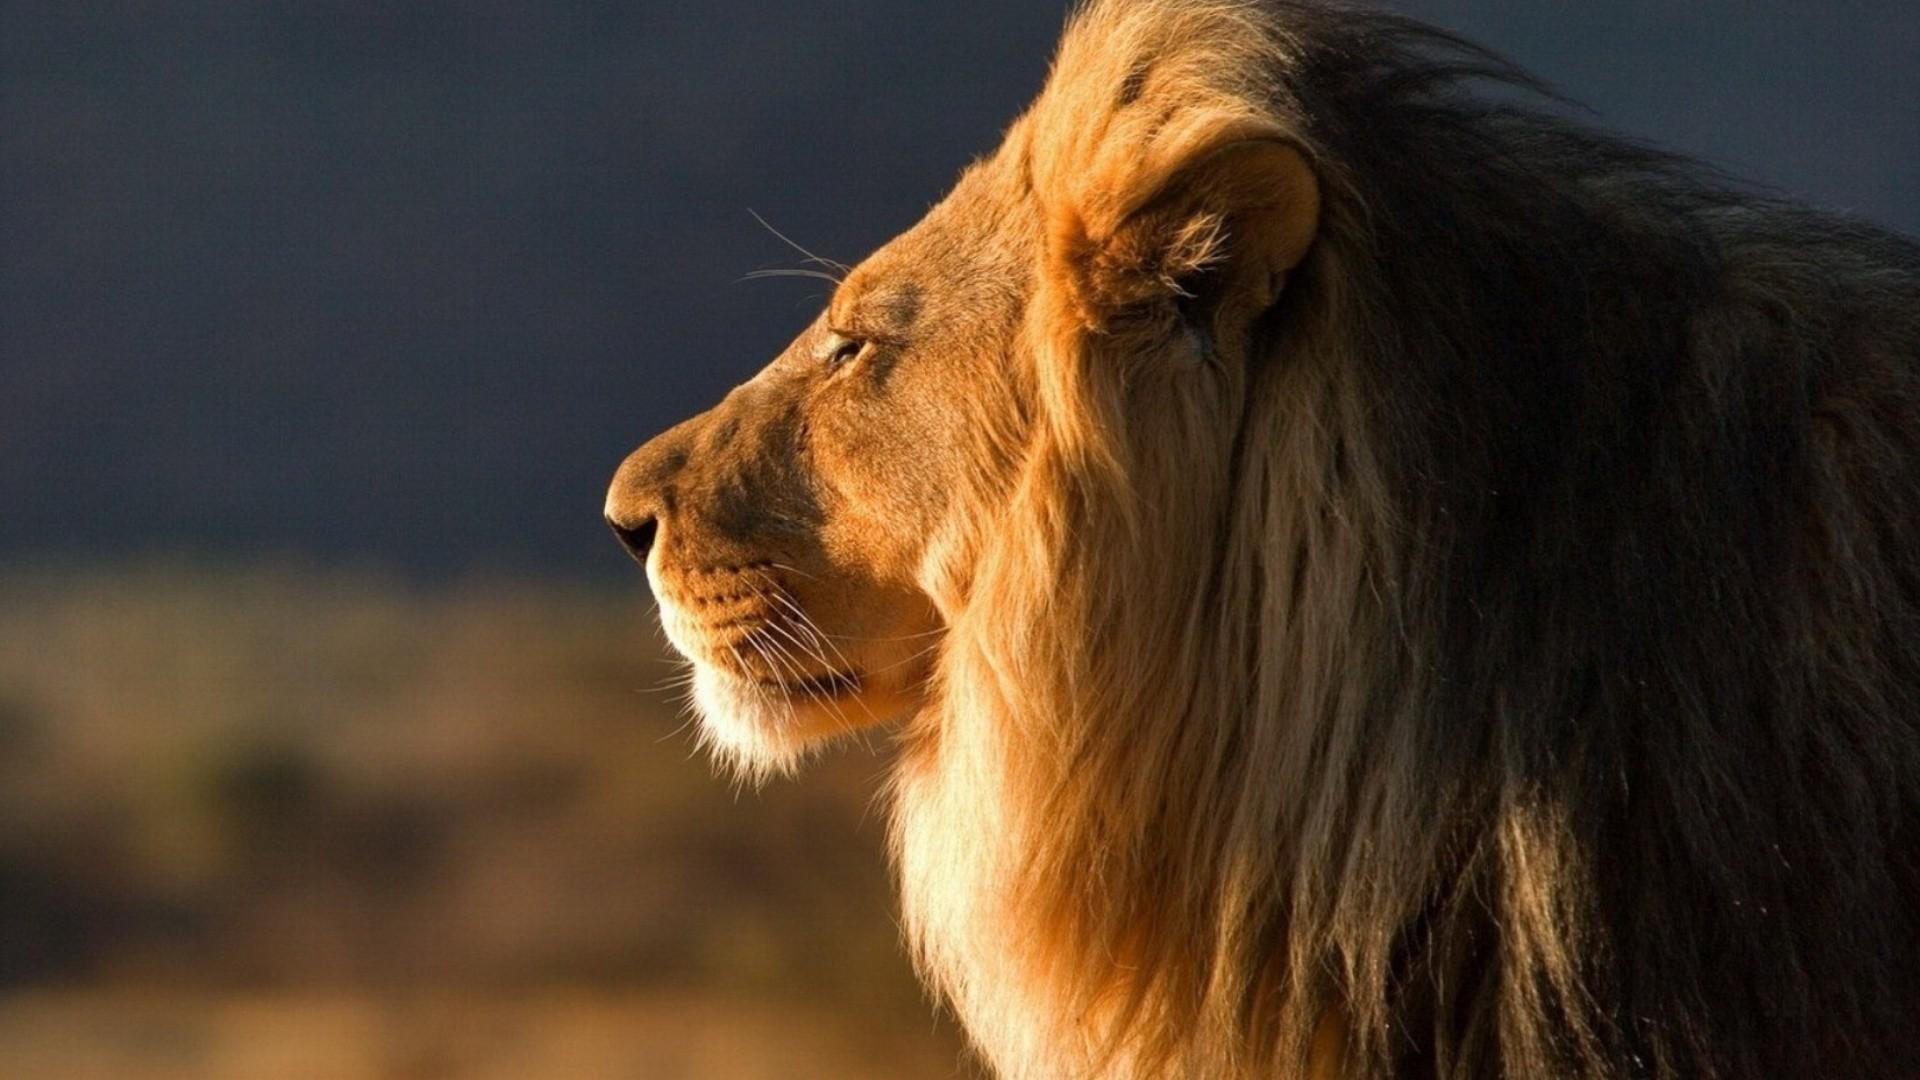 Lion Close Up free Screensaver wallpaper